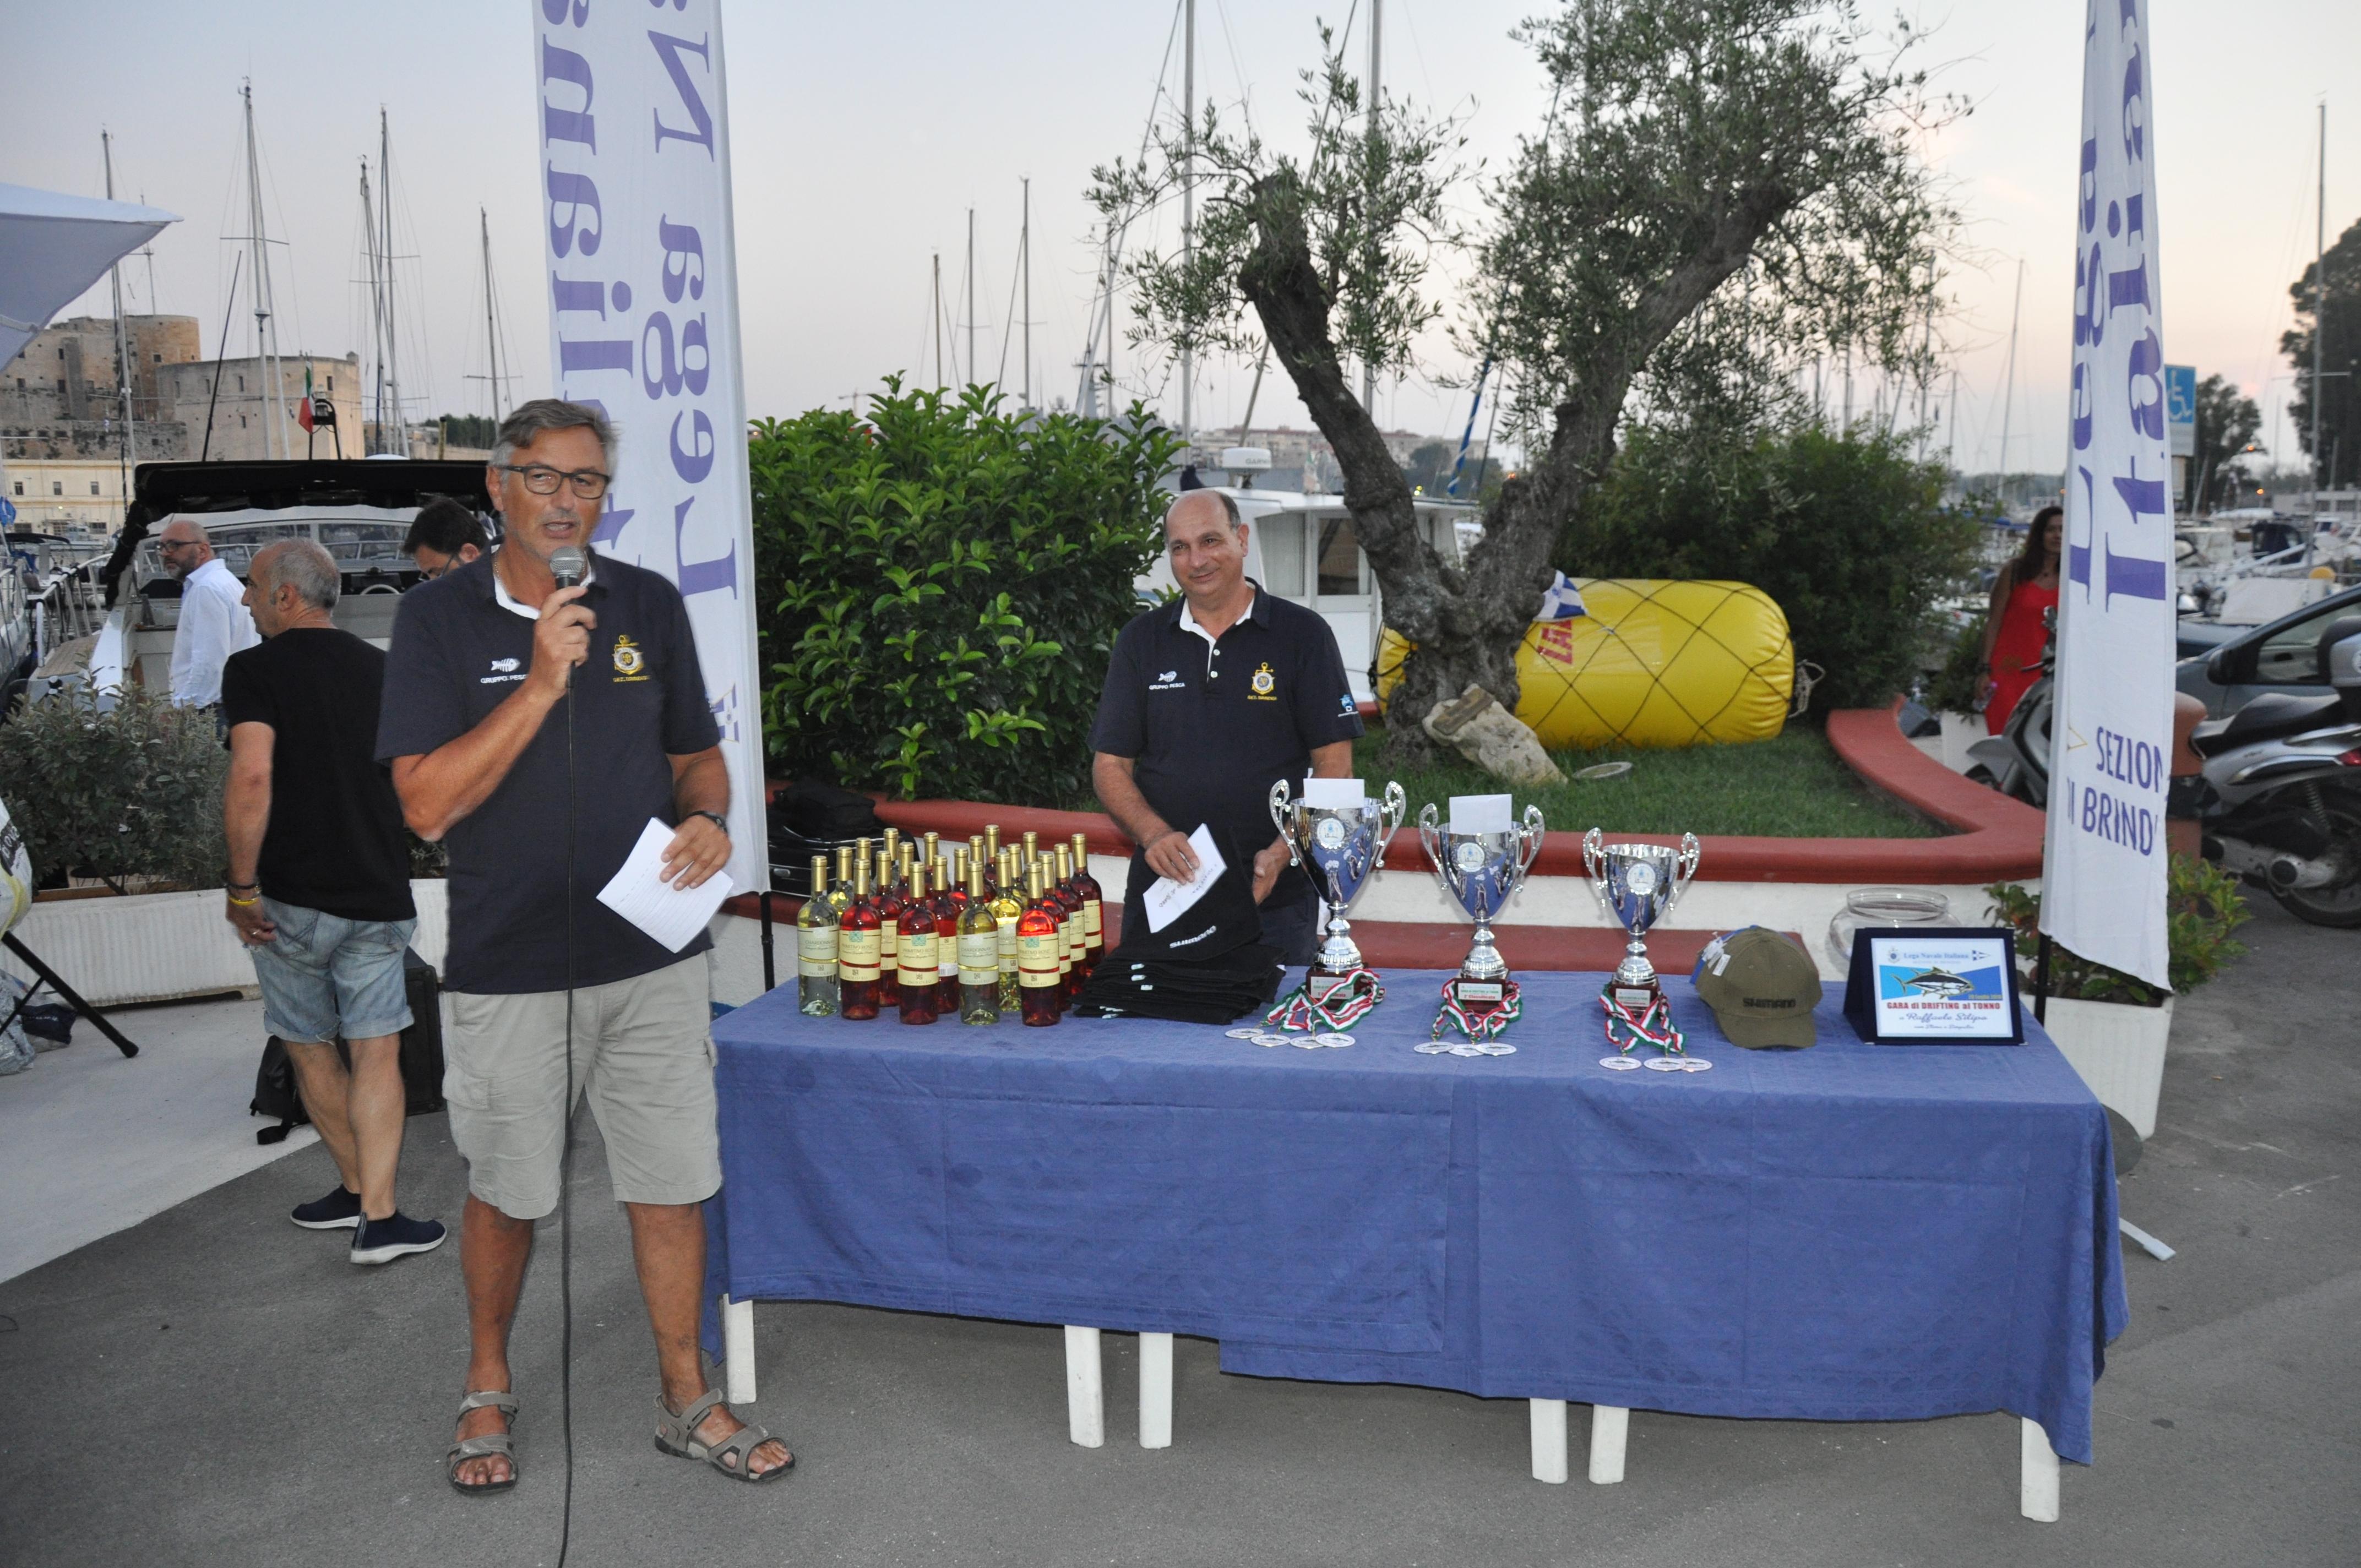 premiazione drifting al tonno 2018 (1)